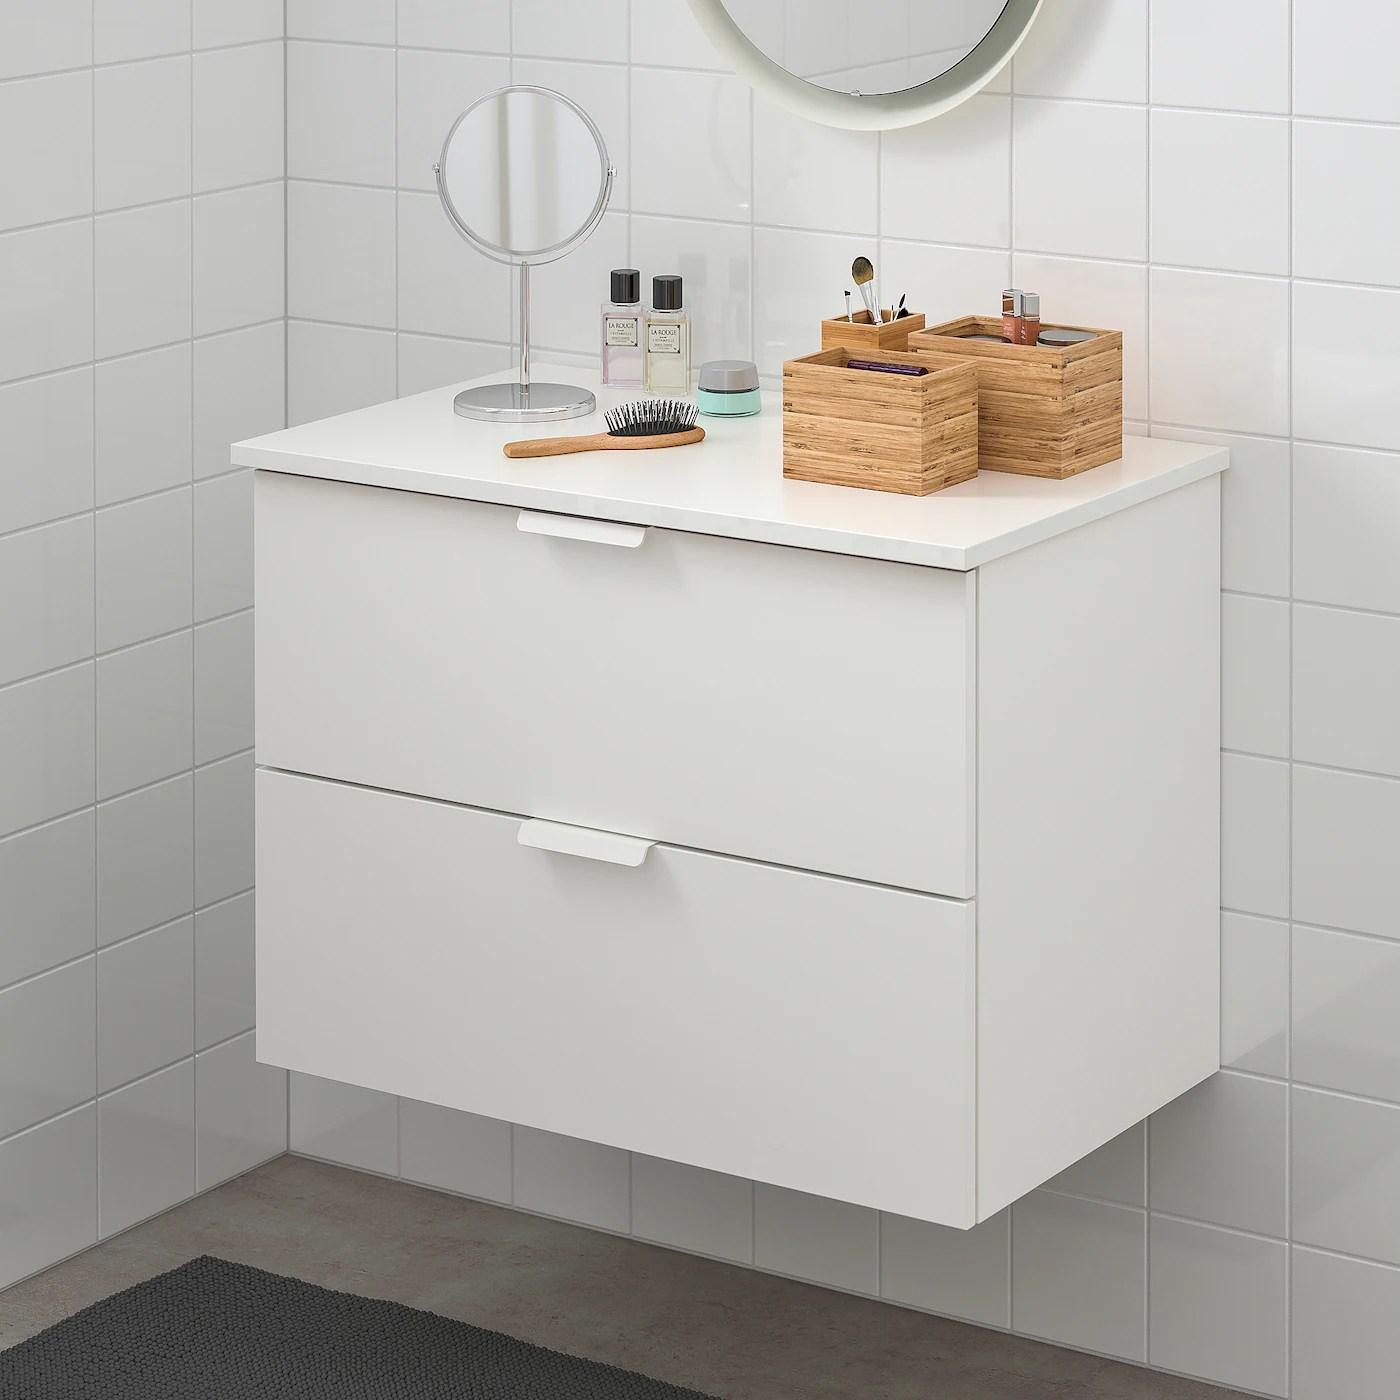 Godmorgon Tolken Meuble Lavabo 2tir Blanc Blanc 82x49x60 Cm Ikea